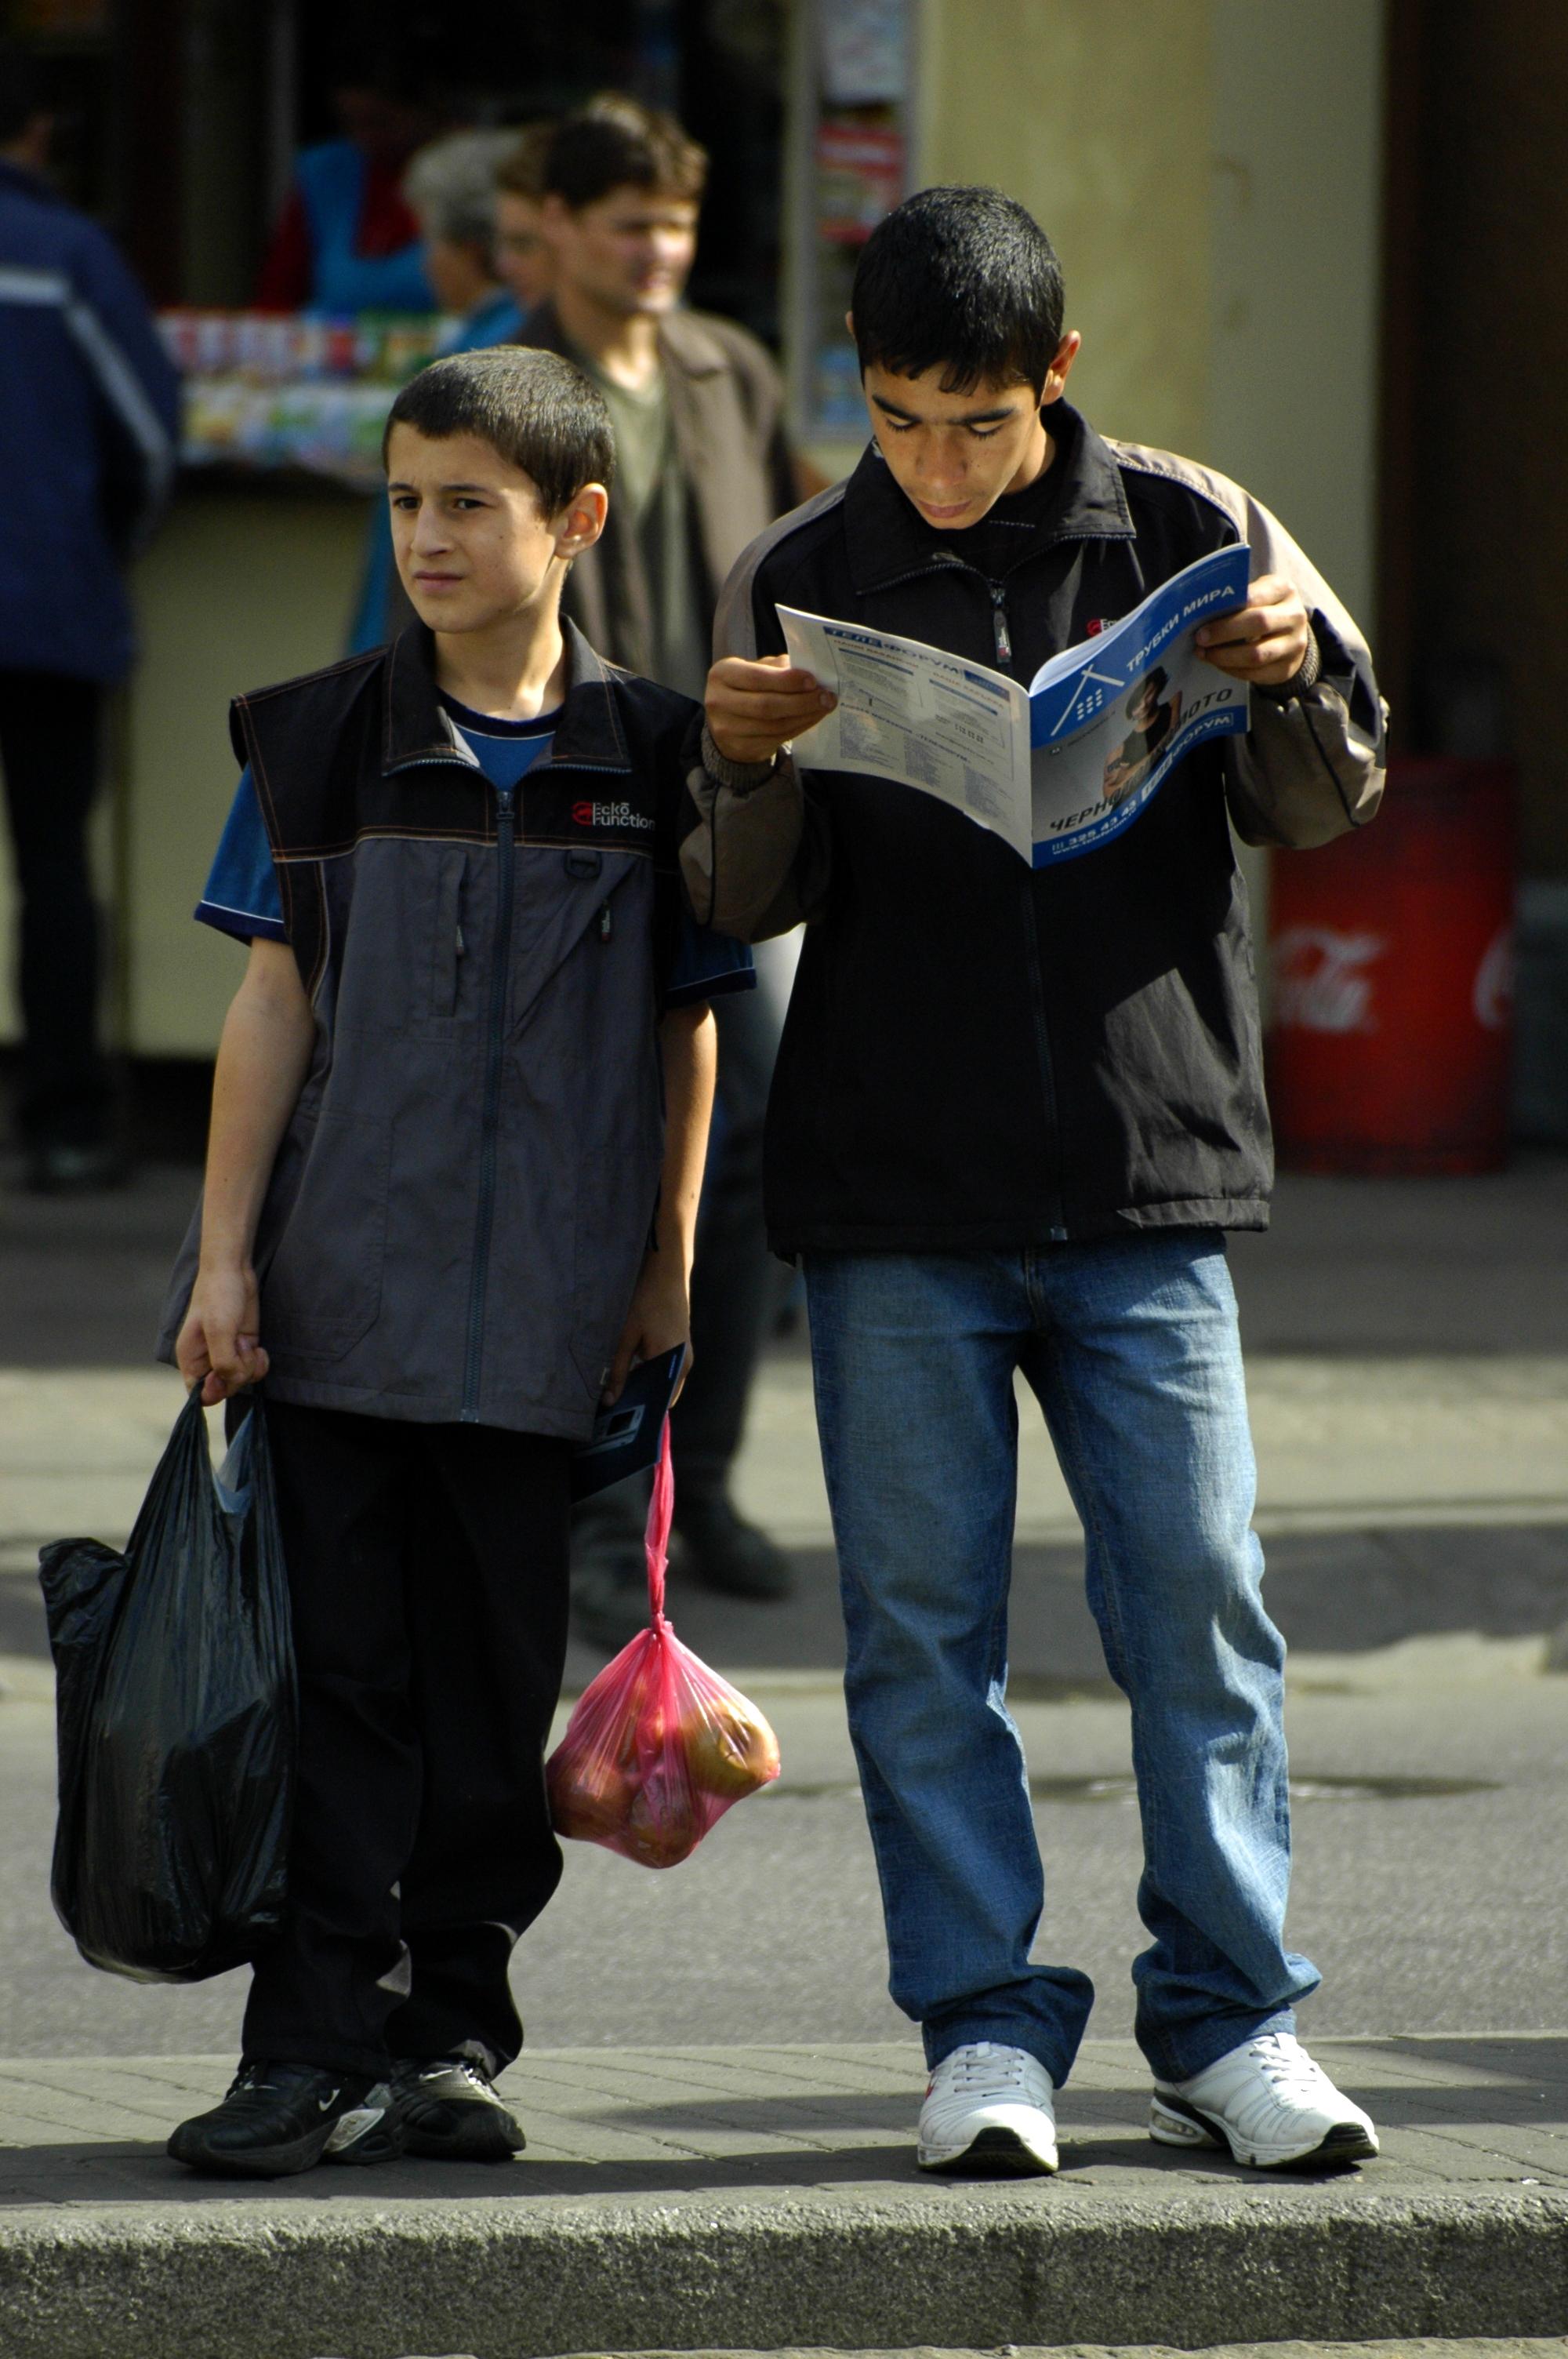 photo of Russian kids in St. Petersburg